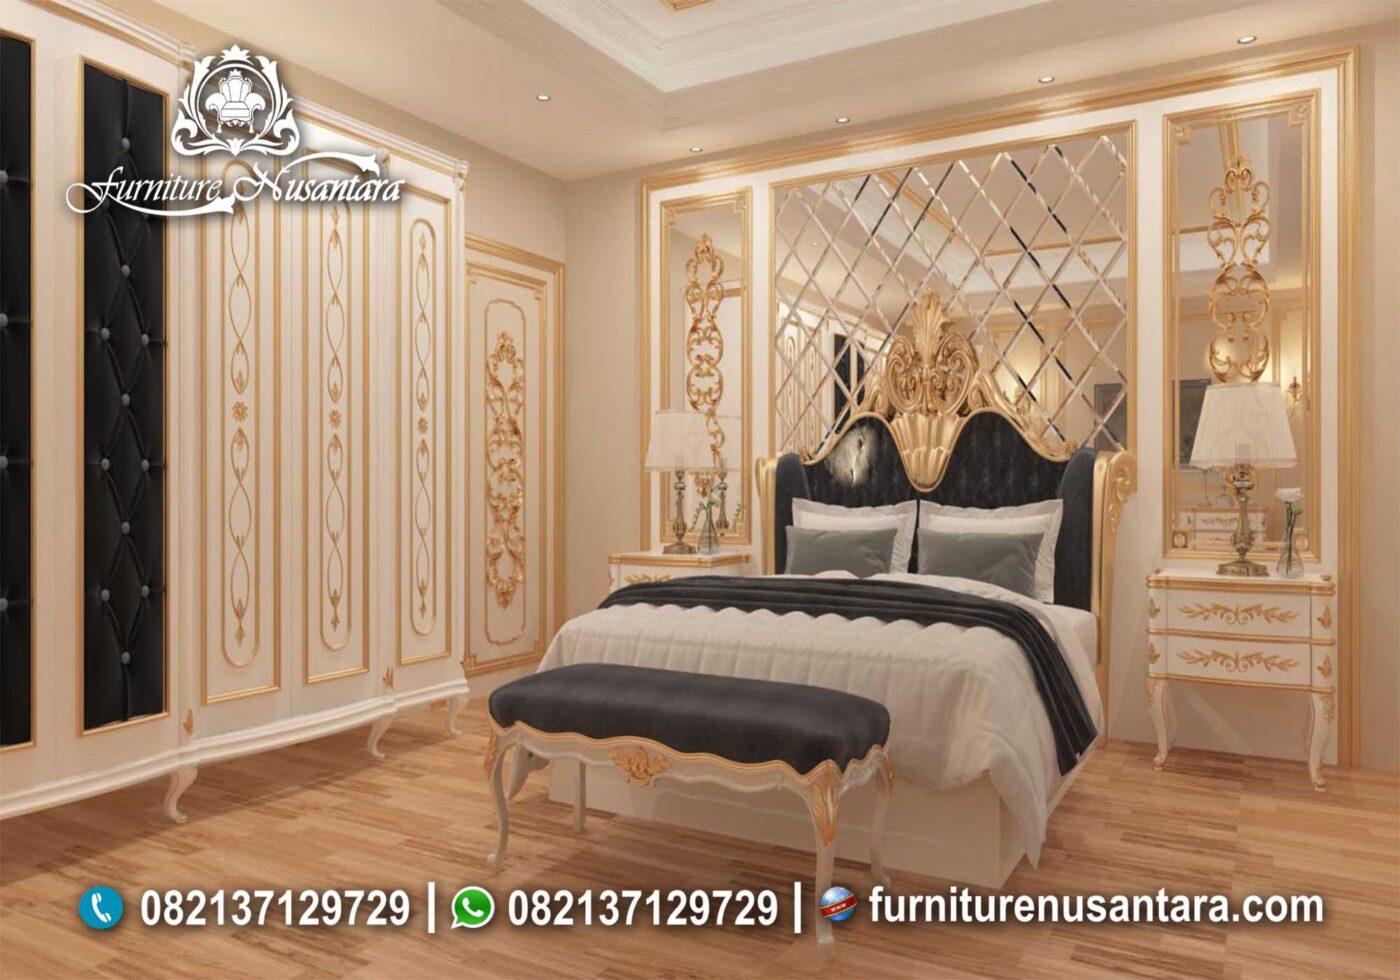 Kamar Set Royal Luxury Elegant KS-10, Furniture Nusantara